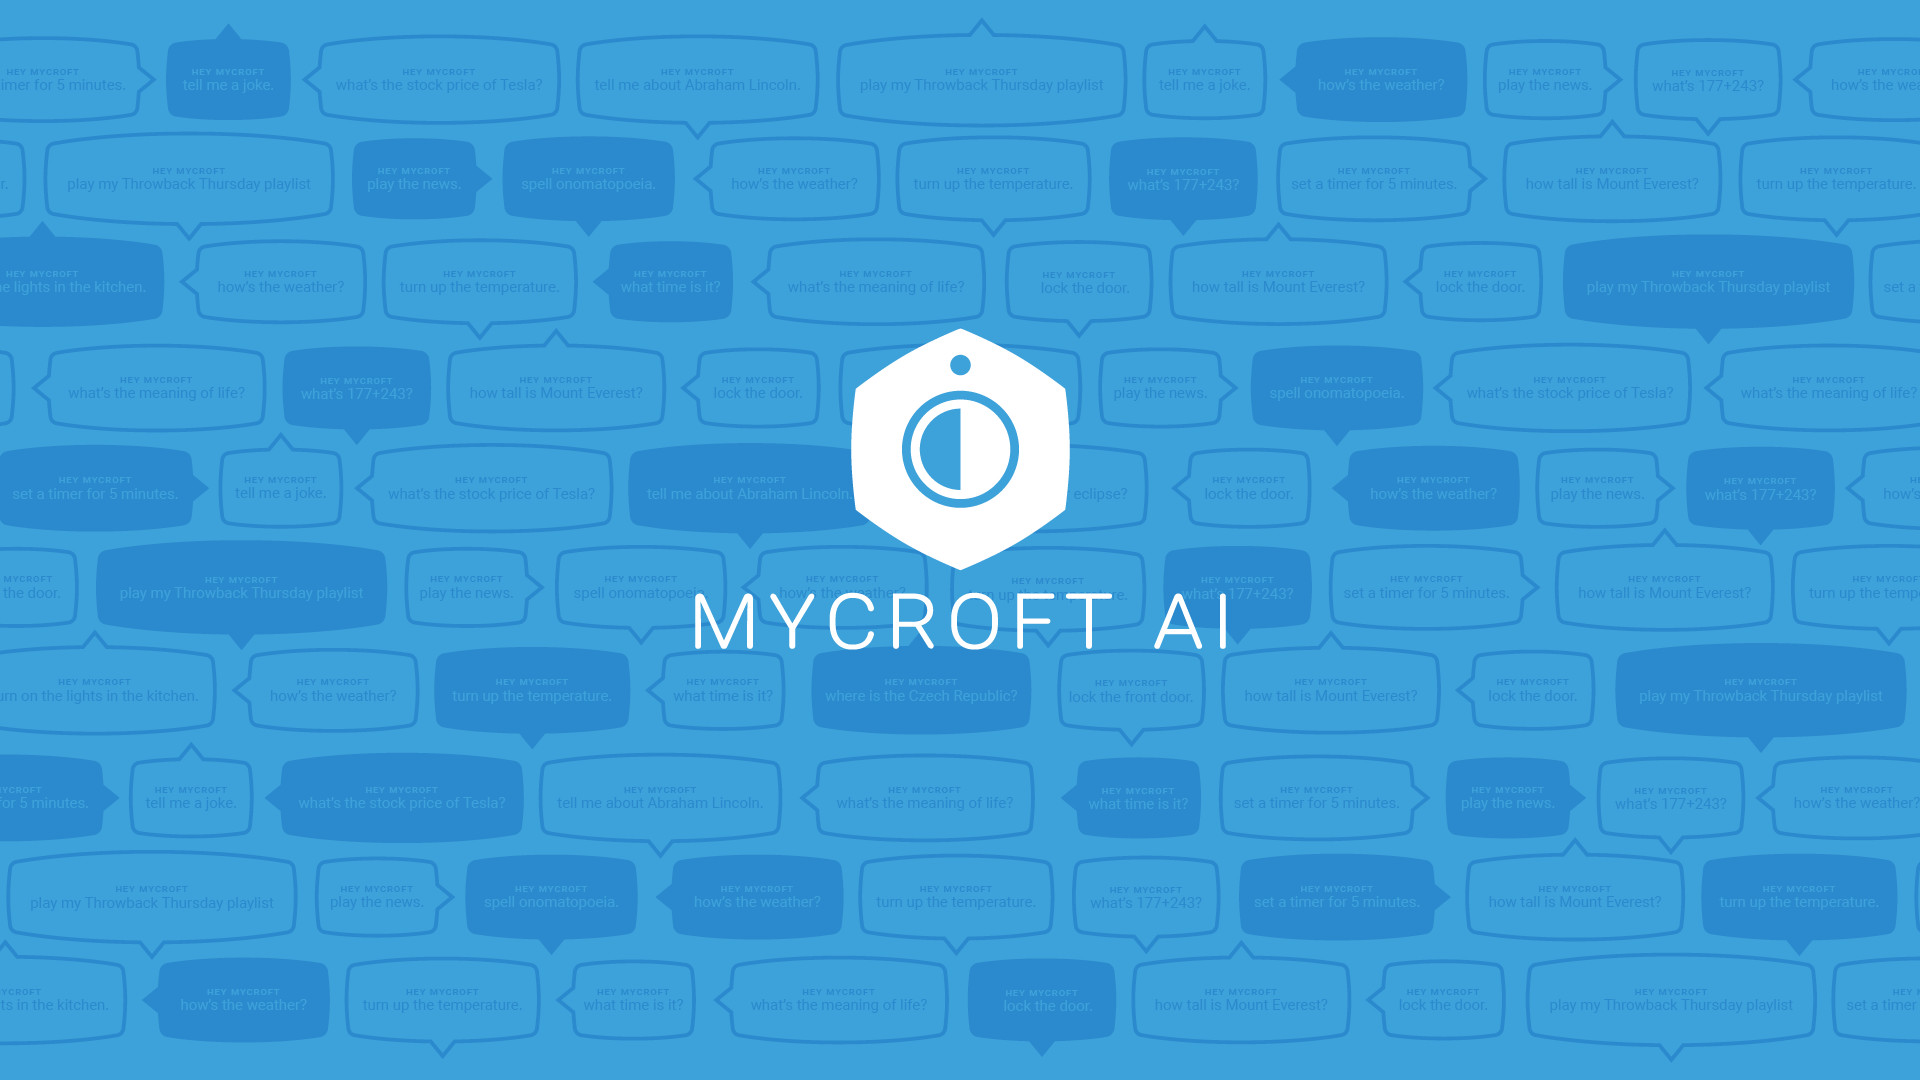 Mycroft AI_desktop bg_HD (1920×1080).png118 KB